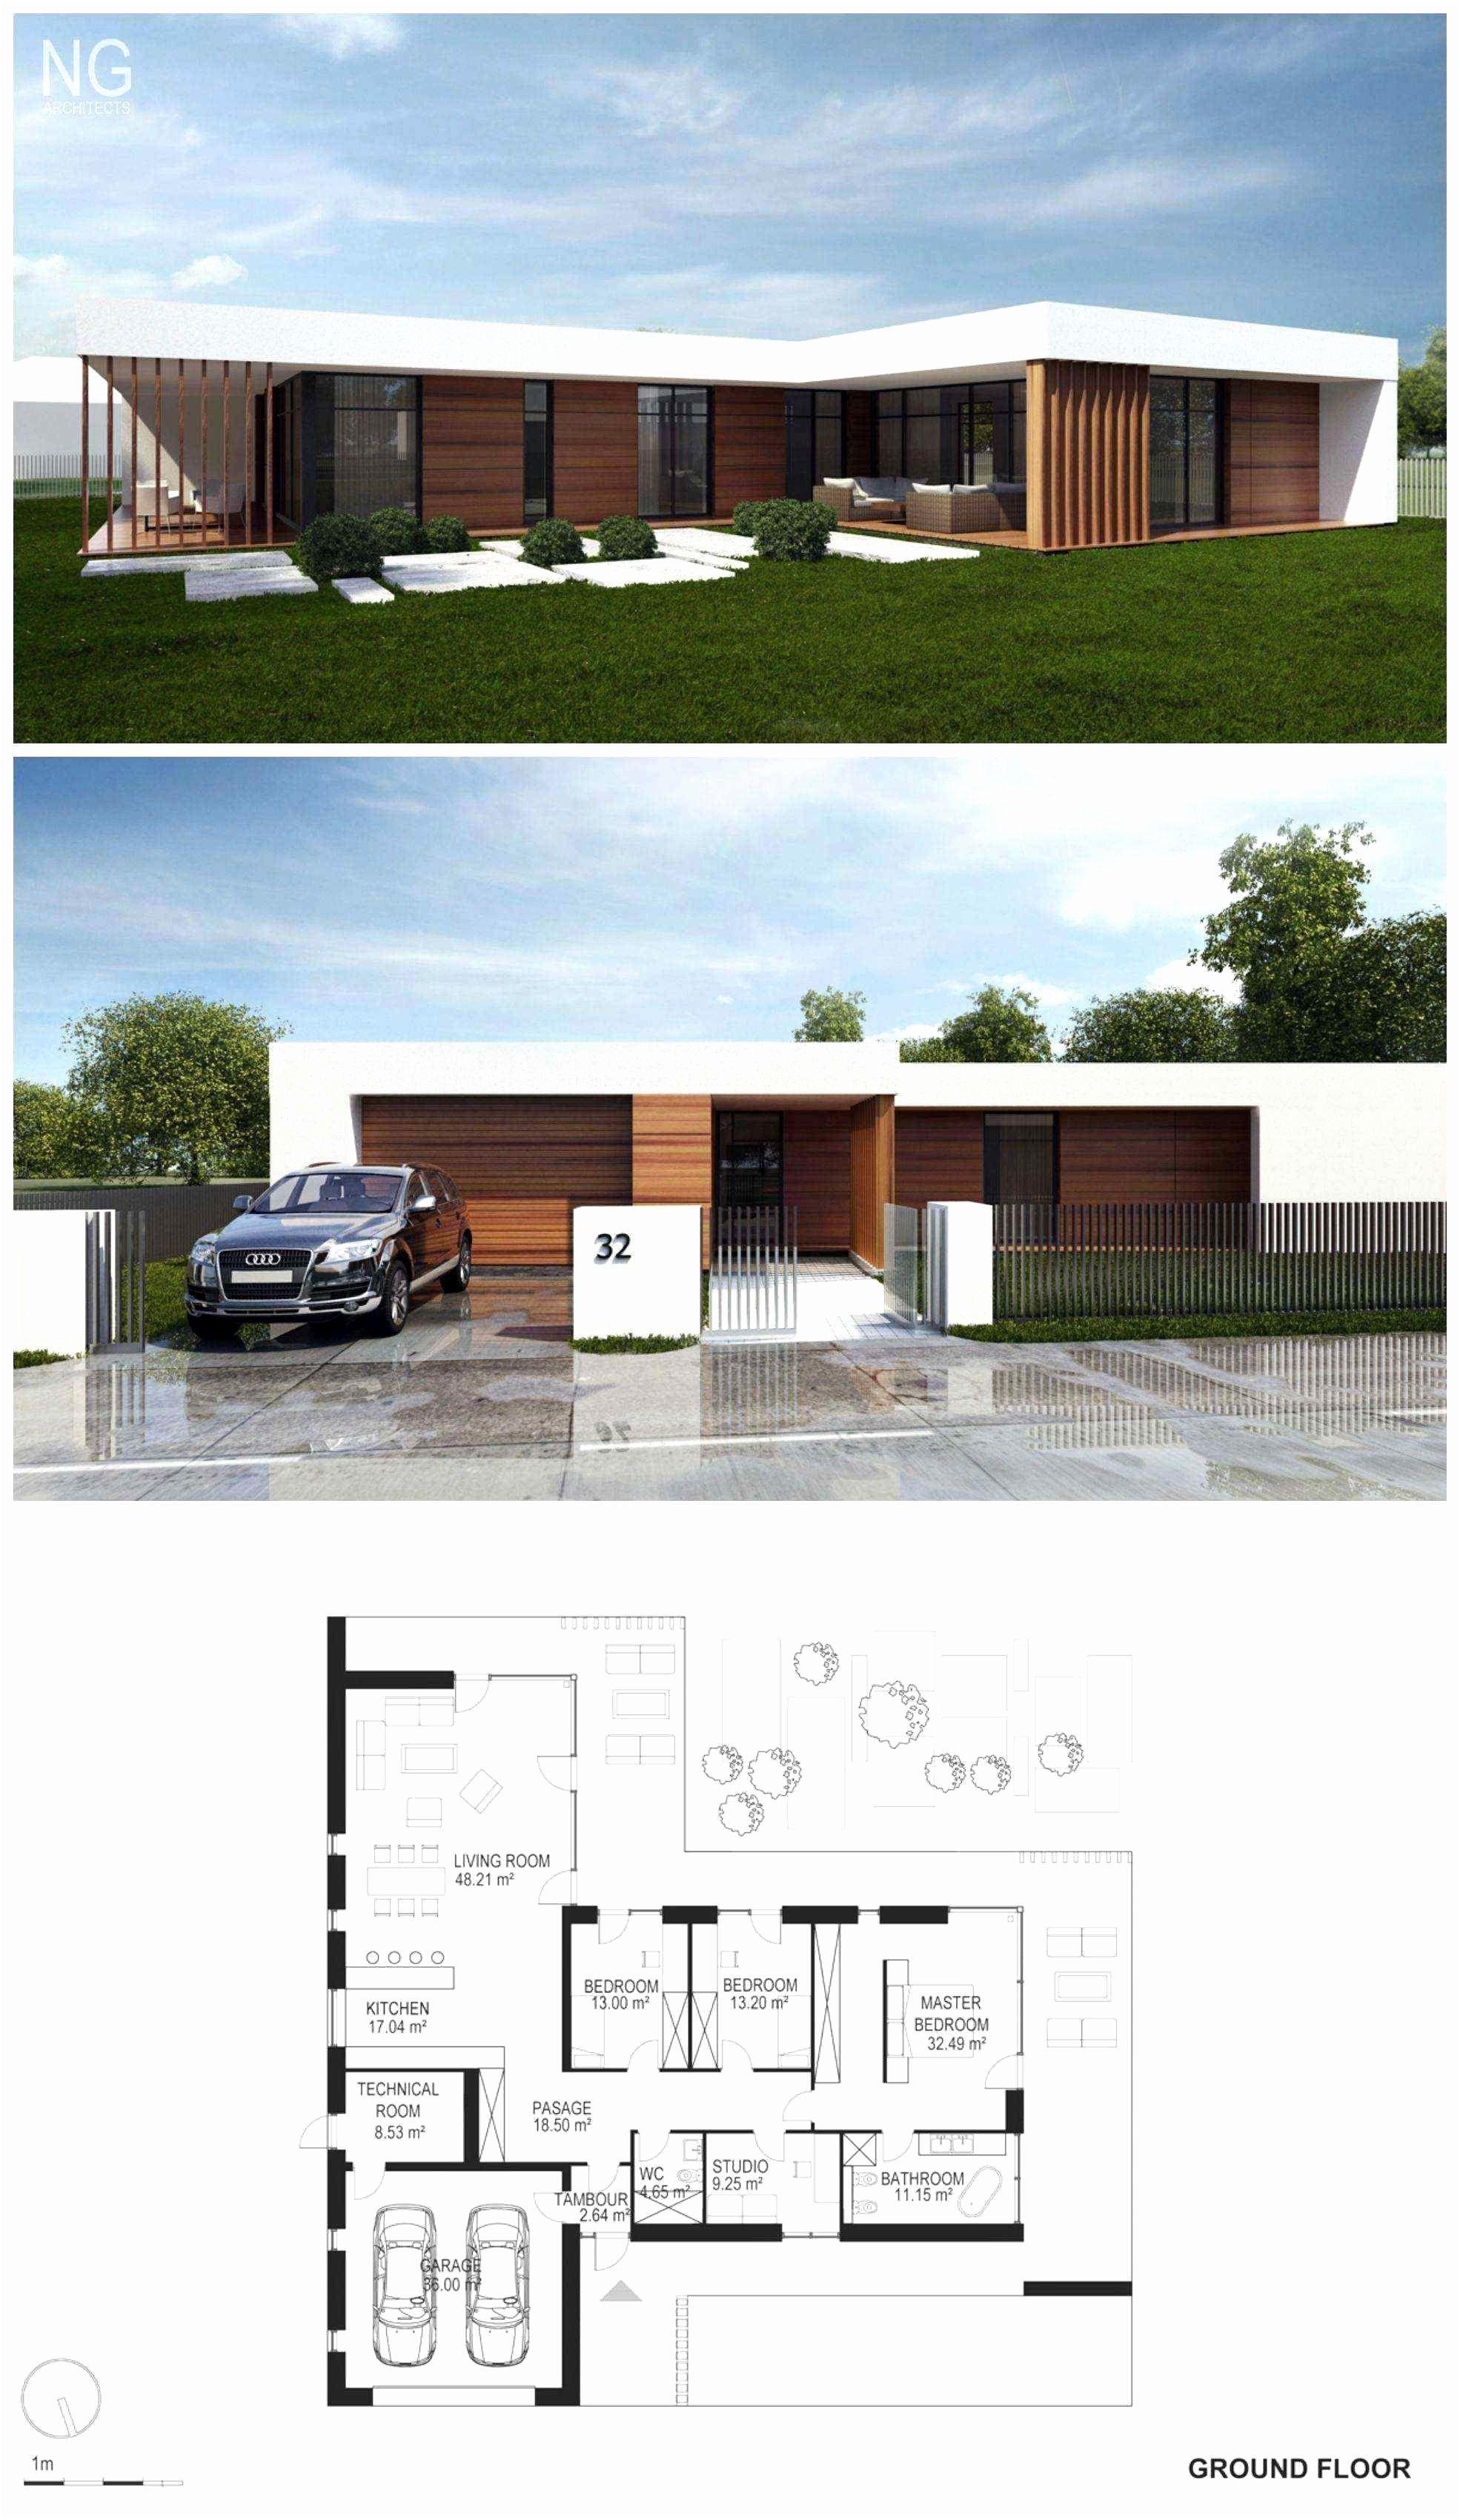 Waterfront House Plans Projectos De Casas Fachadas De Casas Terreas Casas